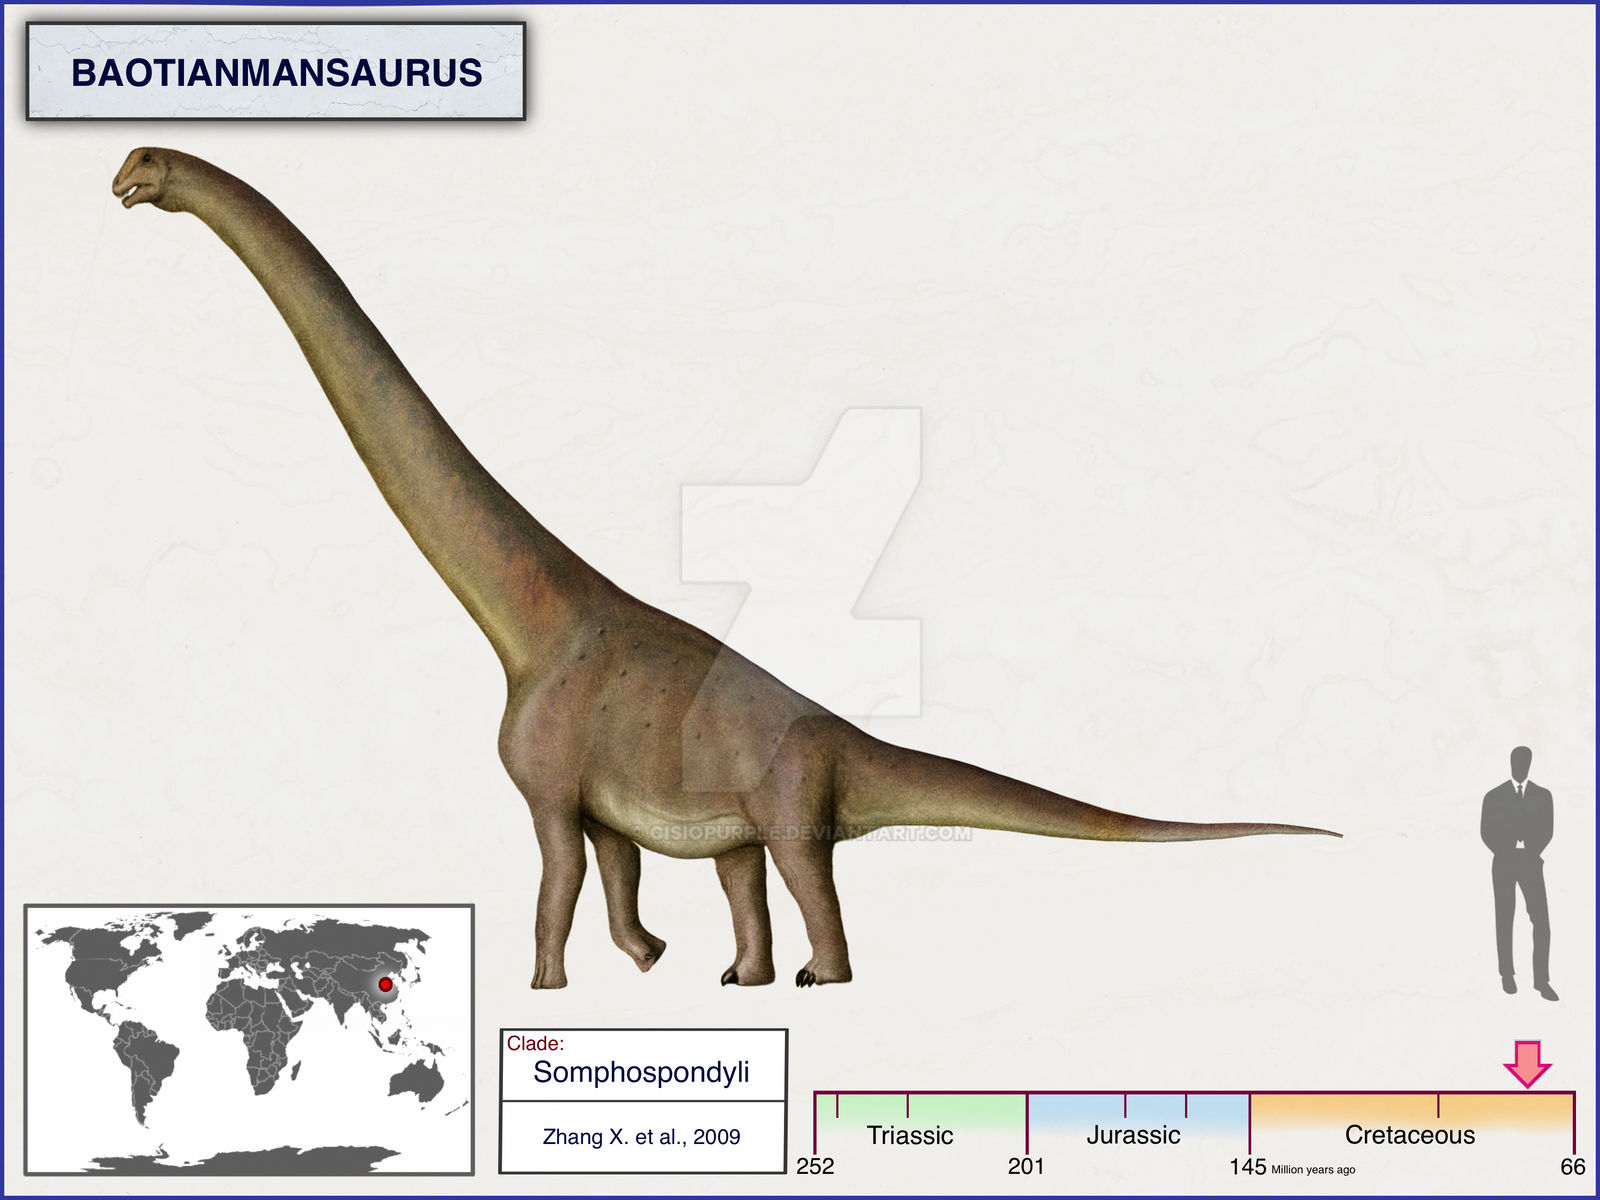 Baotianmansaurus